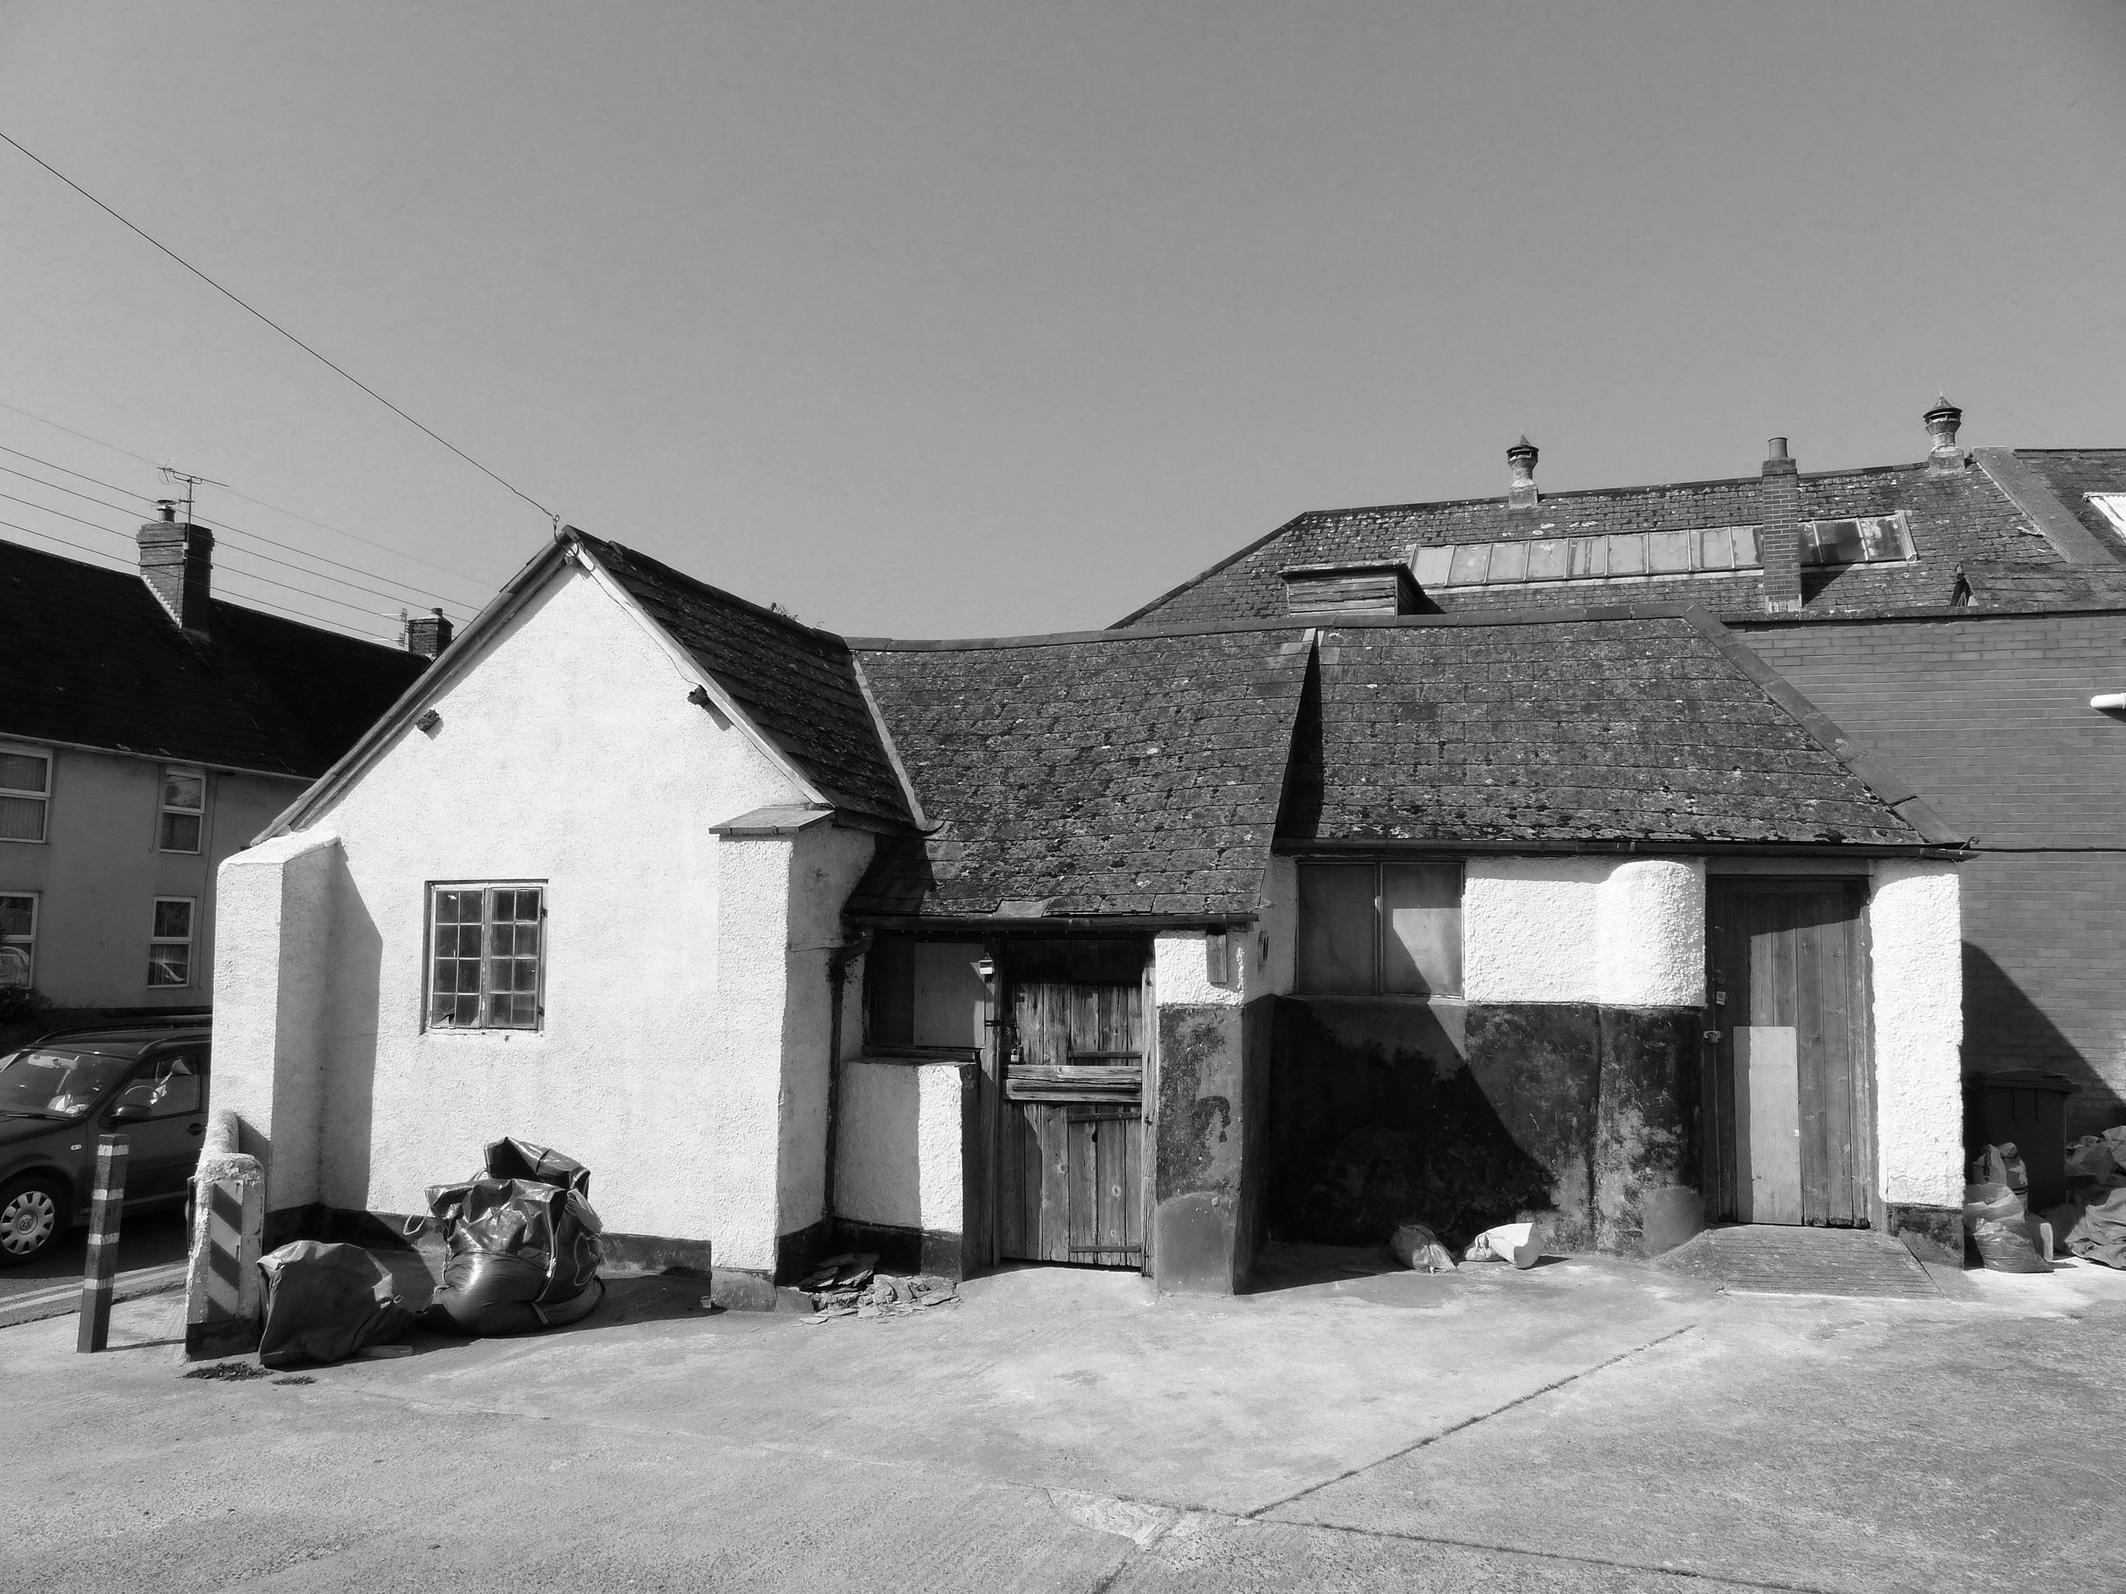 barn-conversion-before-planning-renovation